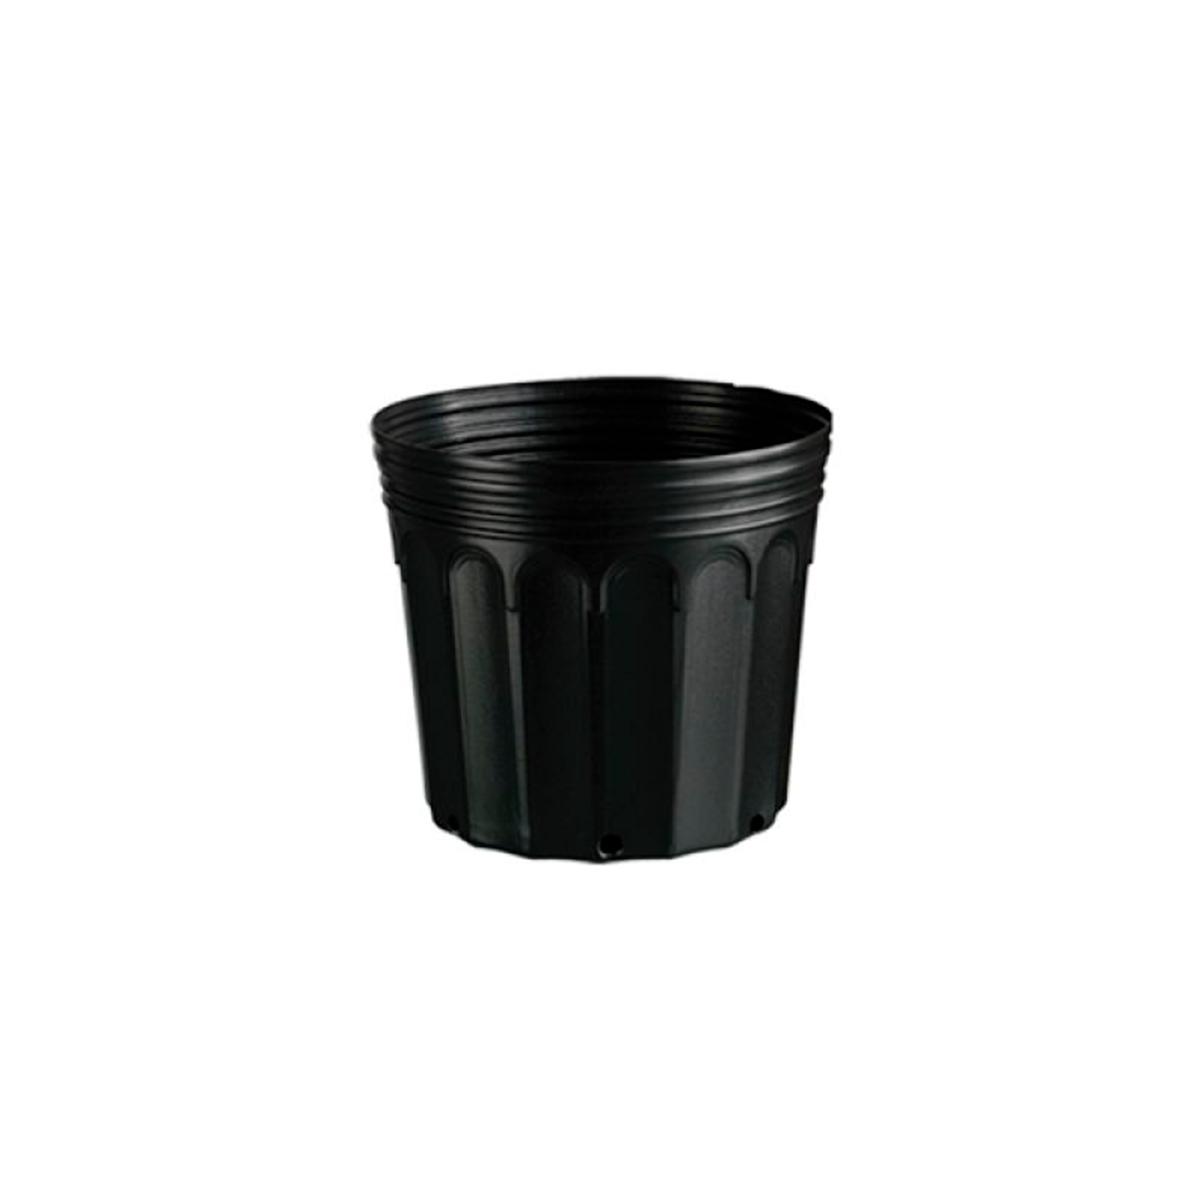 Kit 20 Embalagem para Mudas Flexível Plástico 8,5L